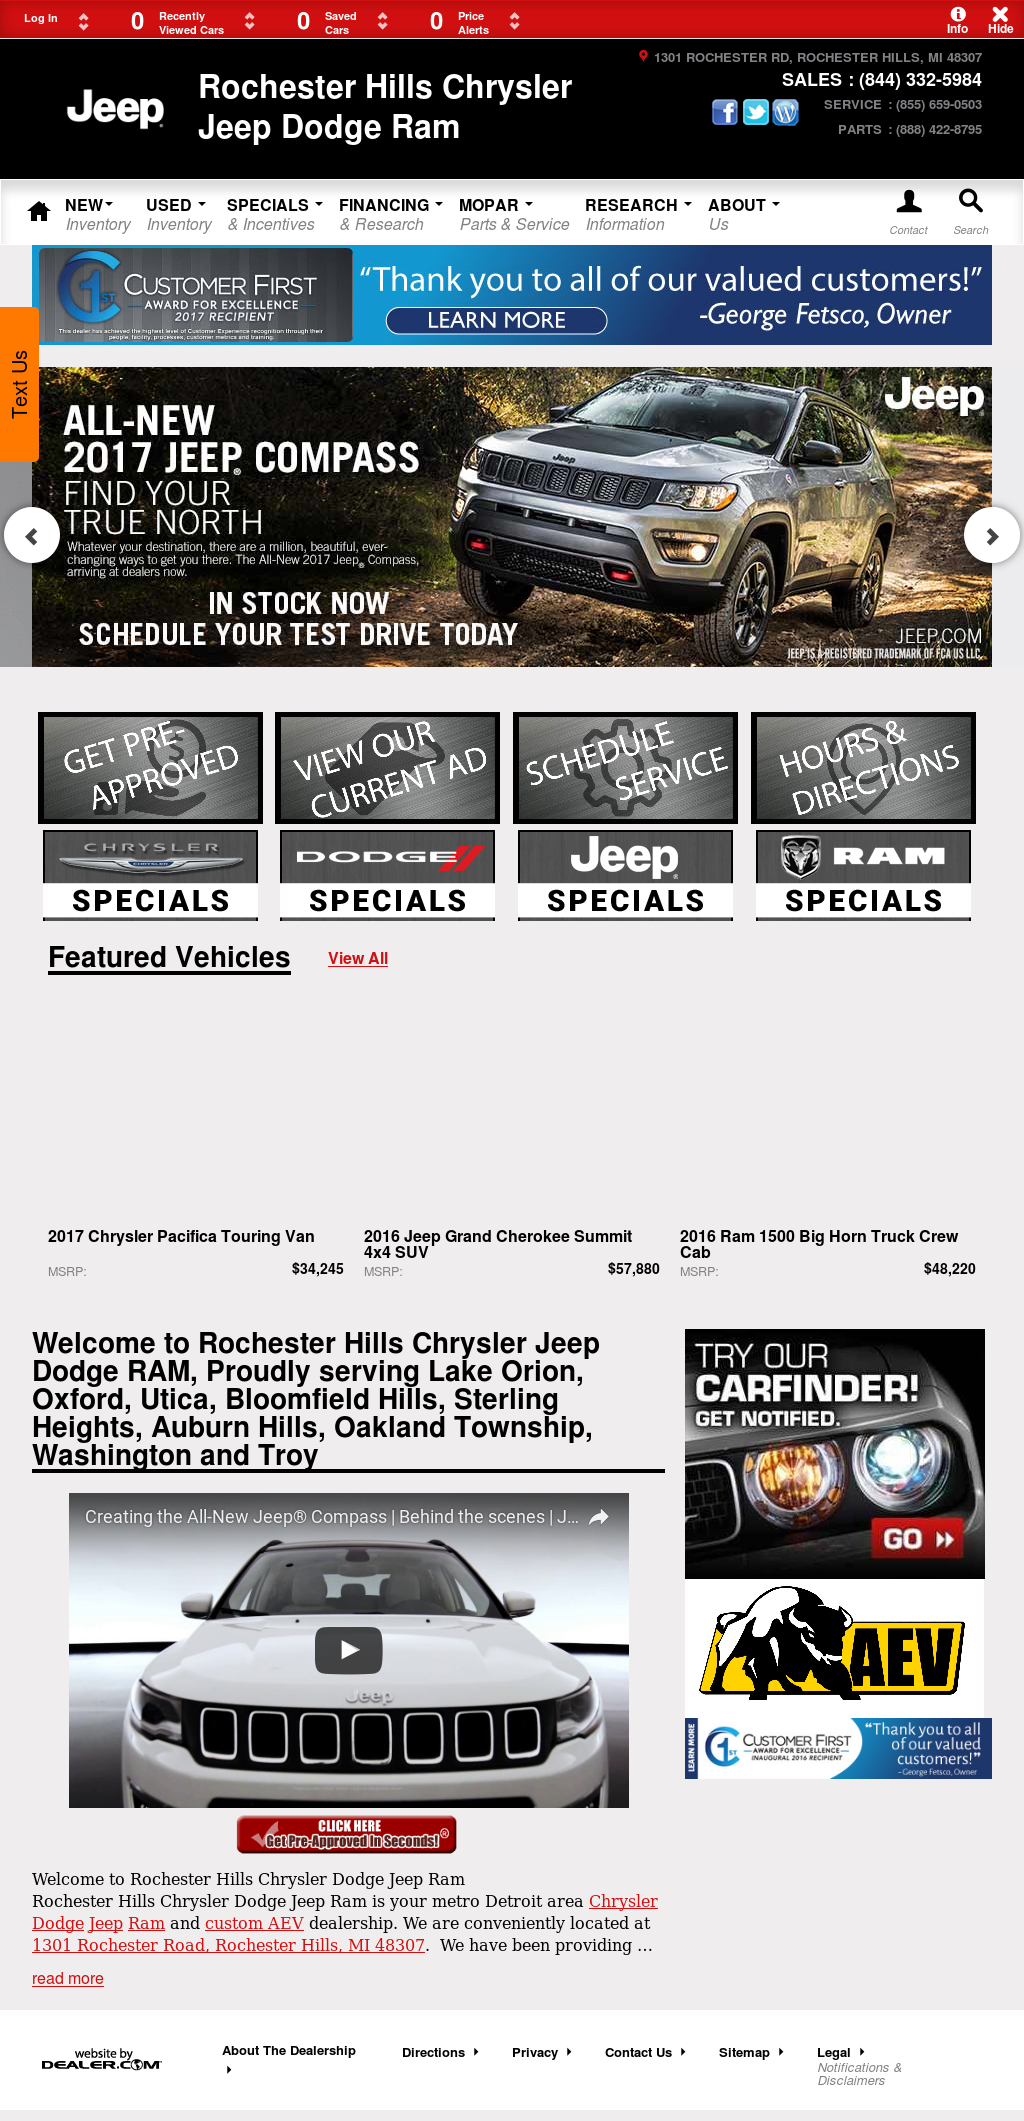 Rochester Hills Chrysler Jeep Dodge Ram Website History